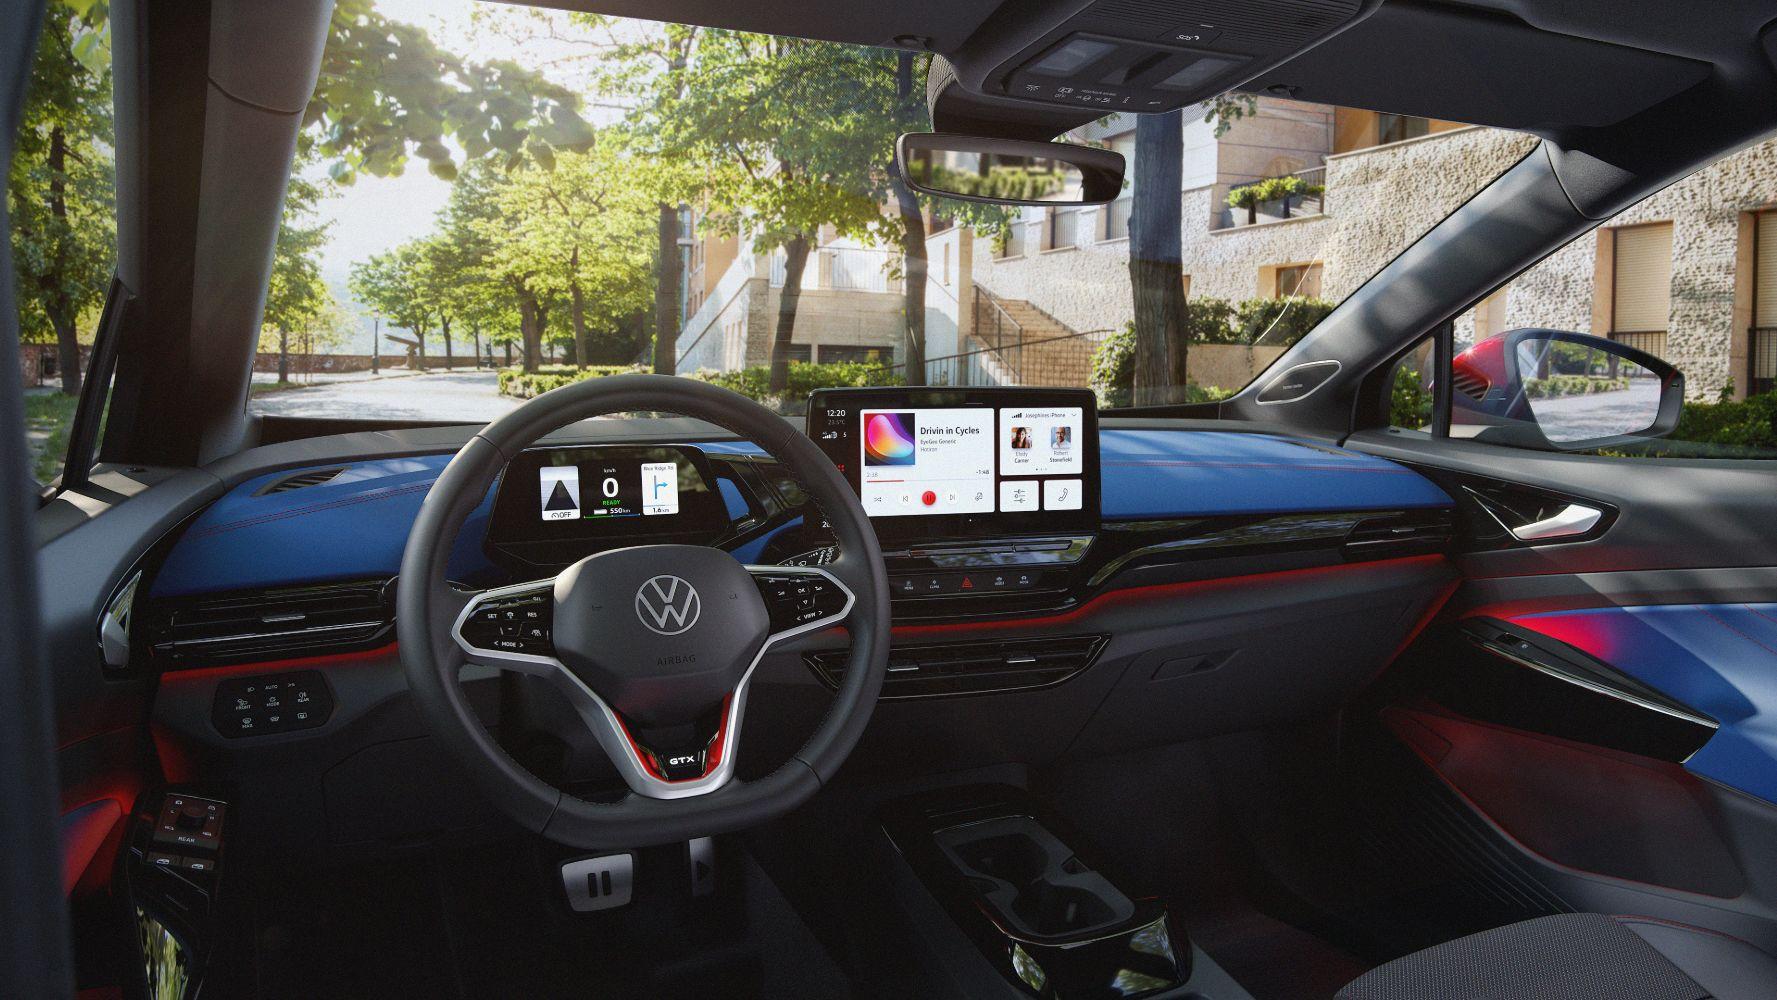 Volkswagen electric VW ID.4 GTX electric car interior dashboard